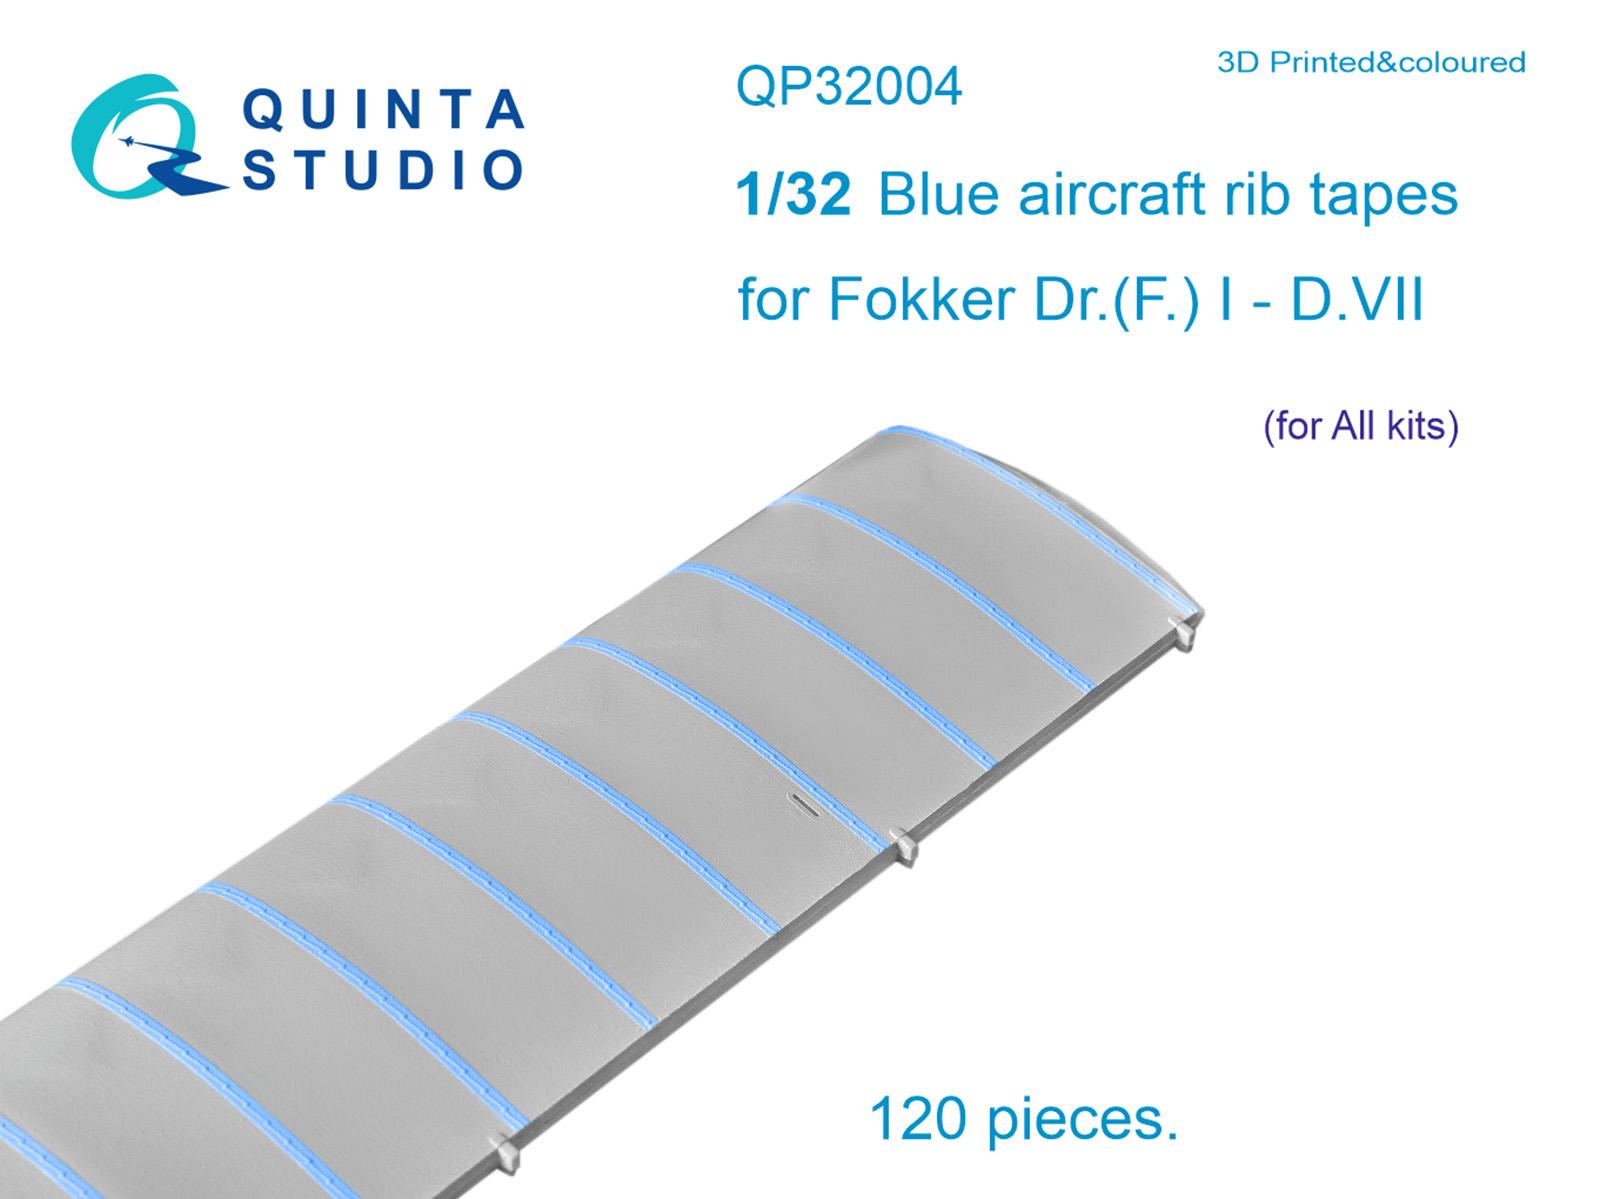 QP32004